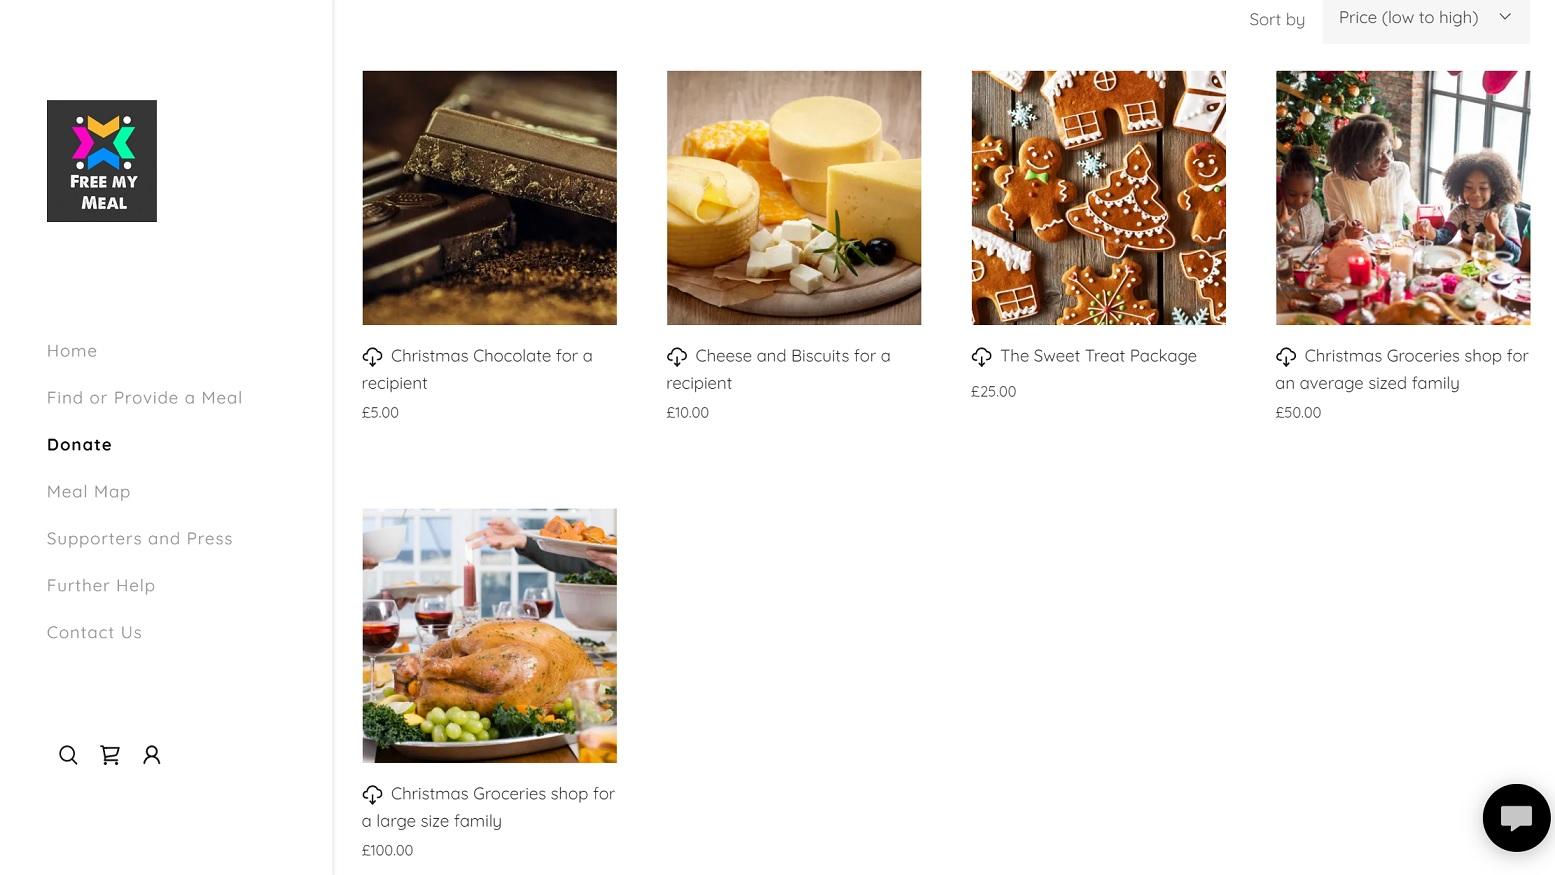 Free My Meal Website Screenshot